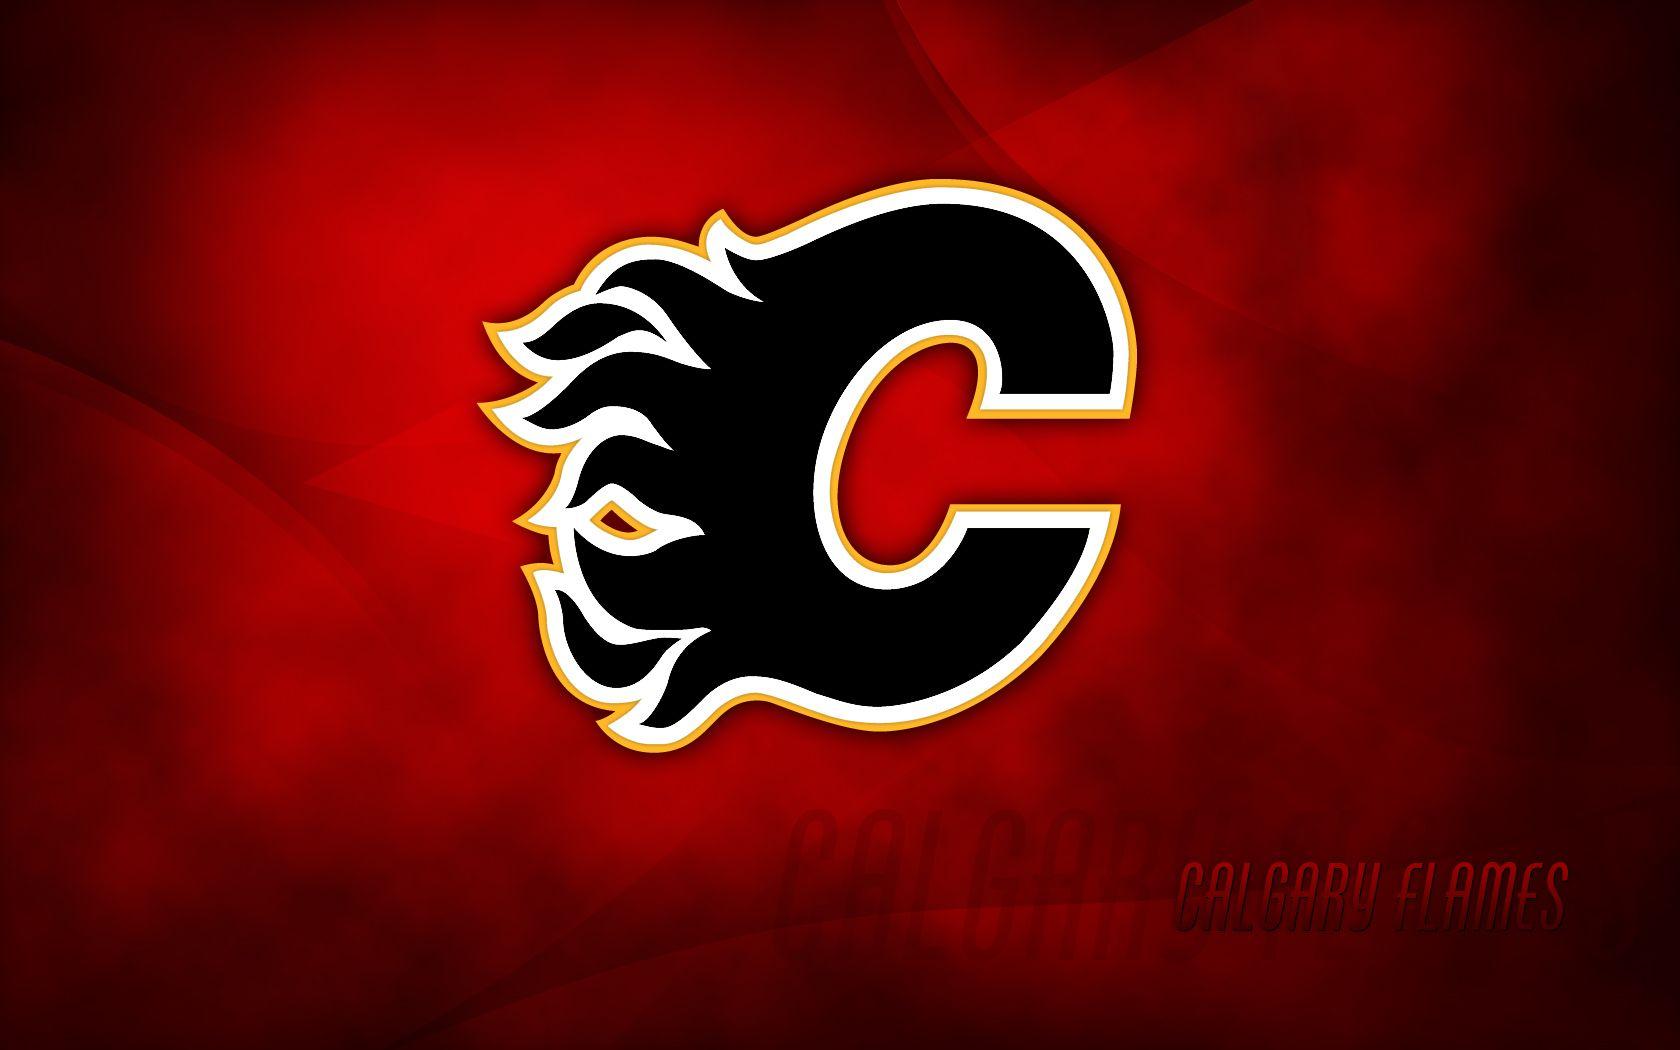 Calgary Flames Wallpaper 1 Nhlwallpapers Com Calgary Flames Calgary Nhl Logos